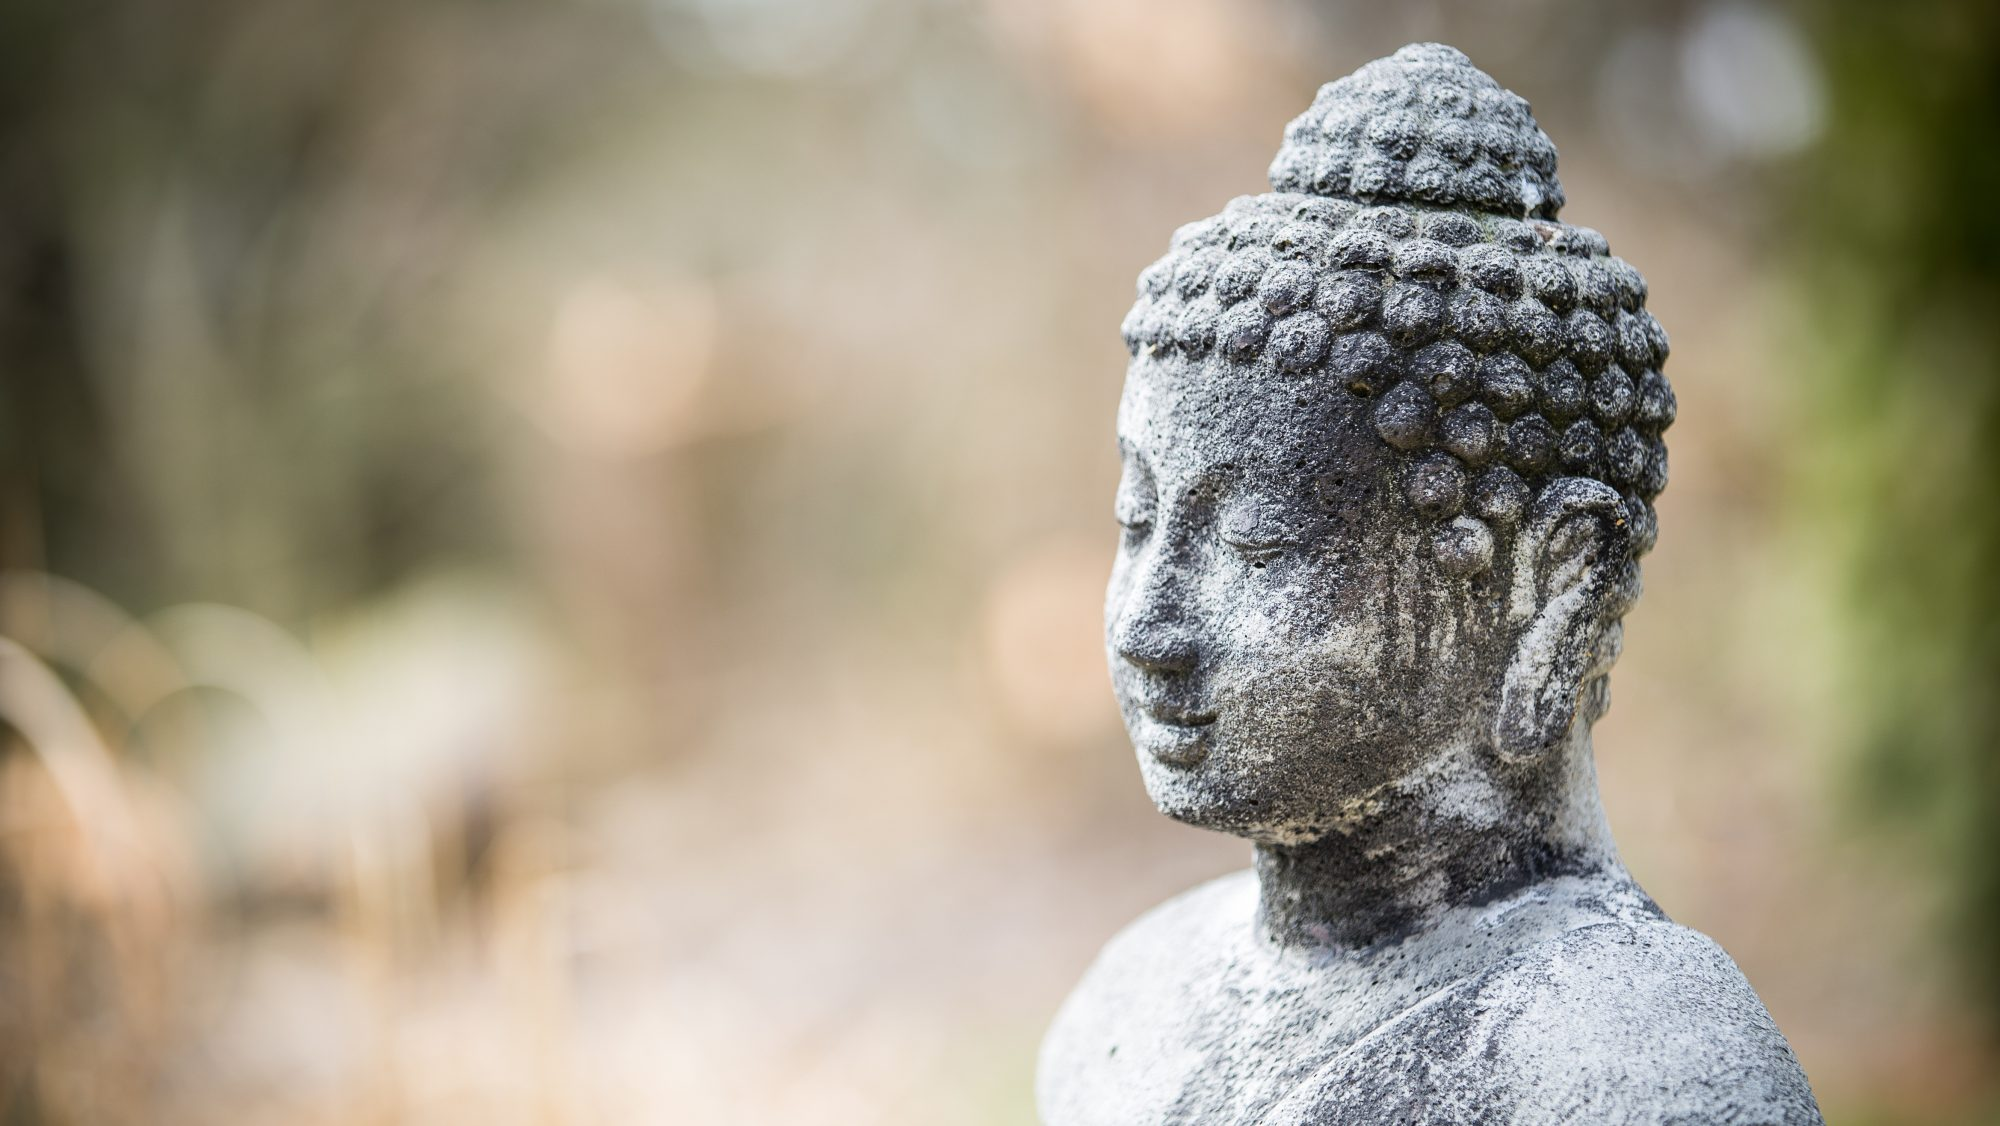 Dao Qi Gong - Der Weg von den 10.000 Dingen zum Kern unserer Lebenssubstanz